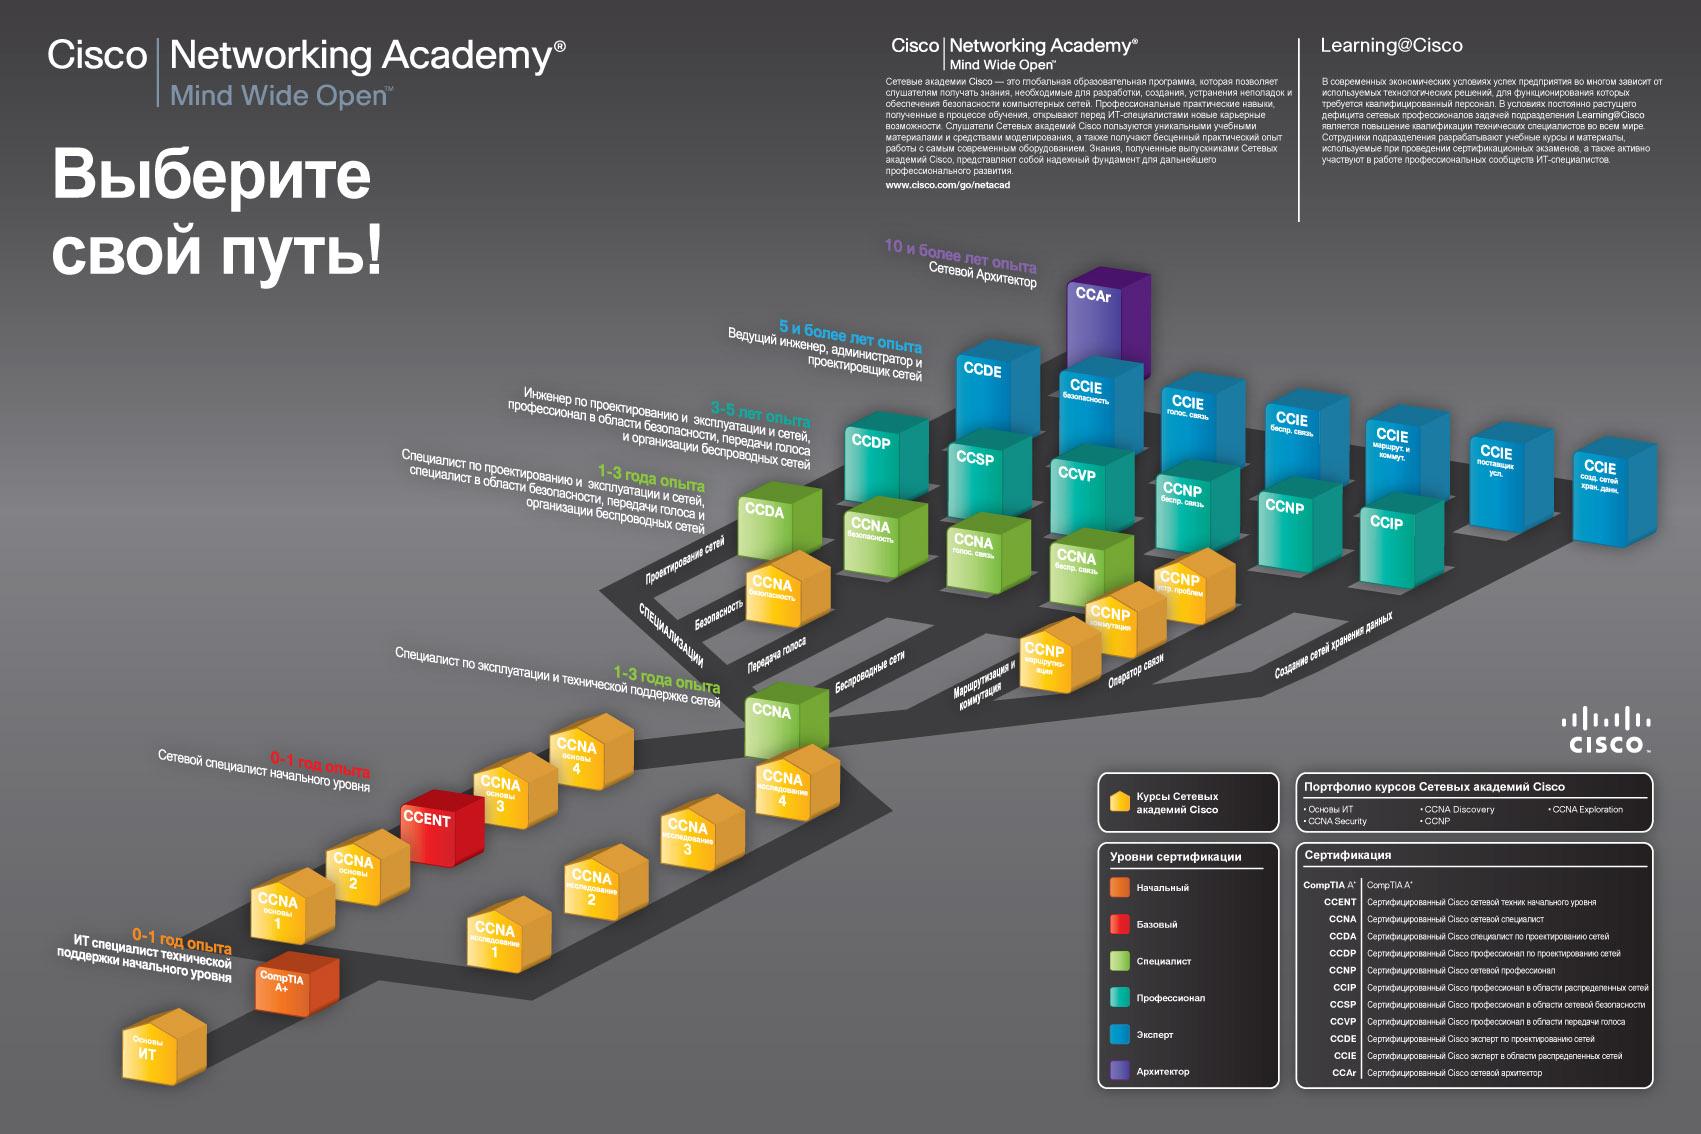 Структура обучающих программ Сетевой академии Cisco